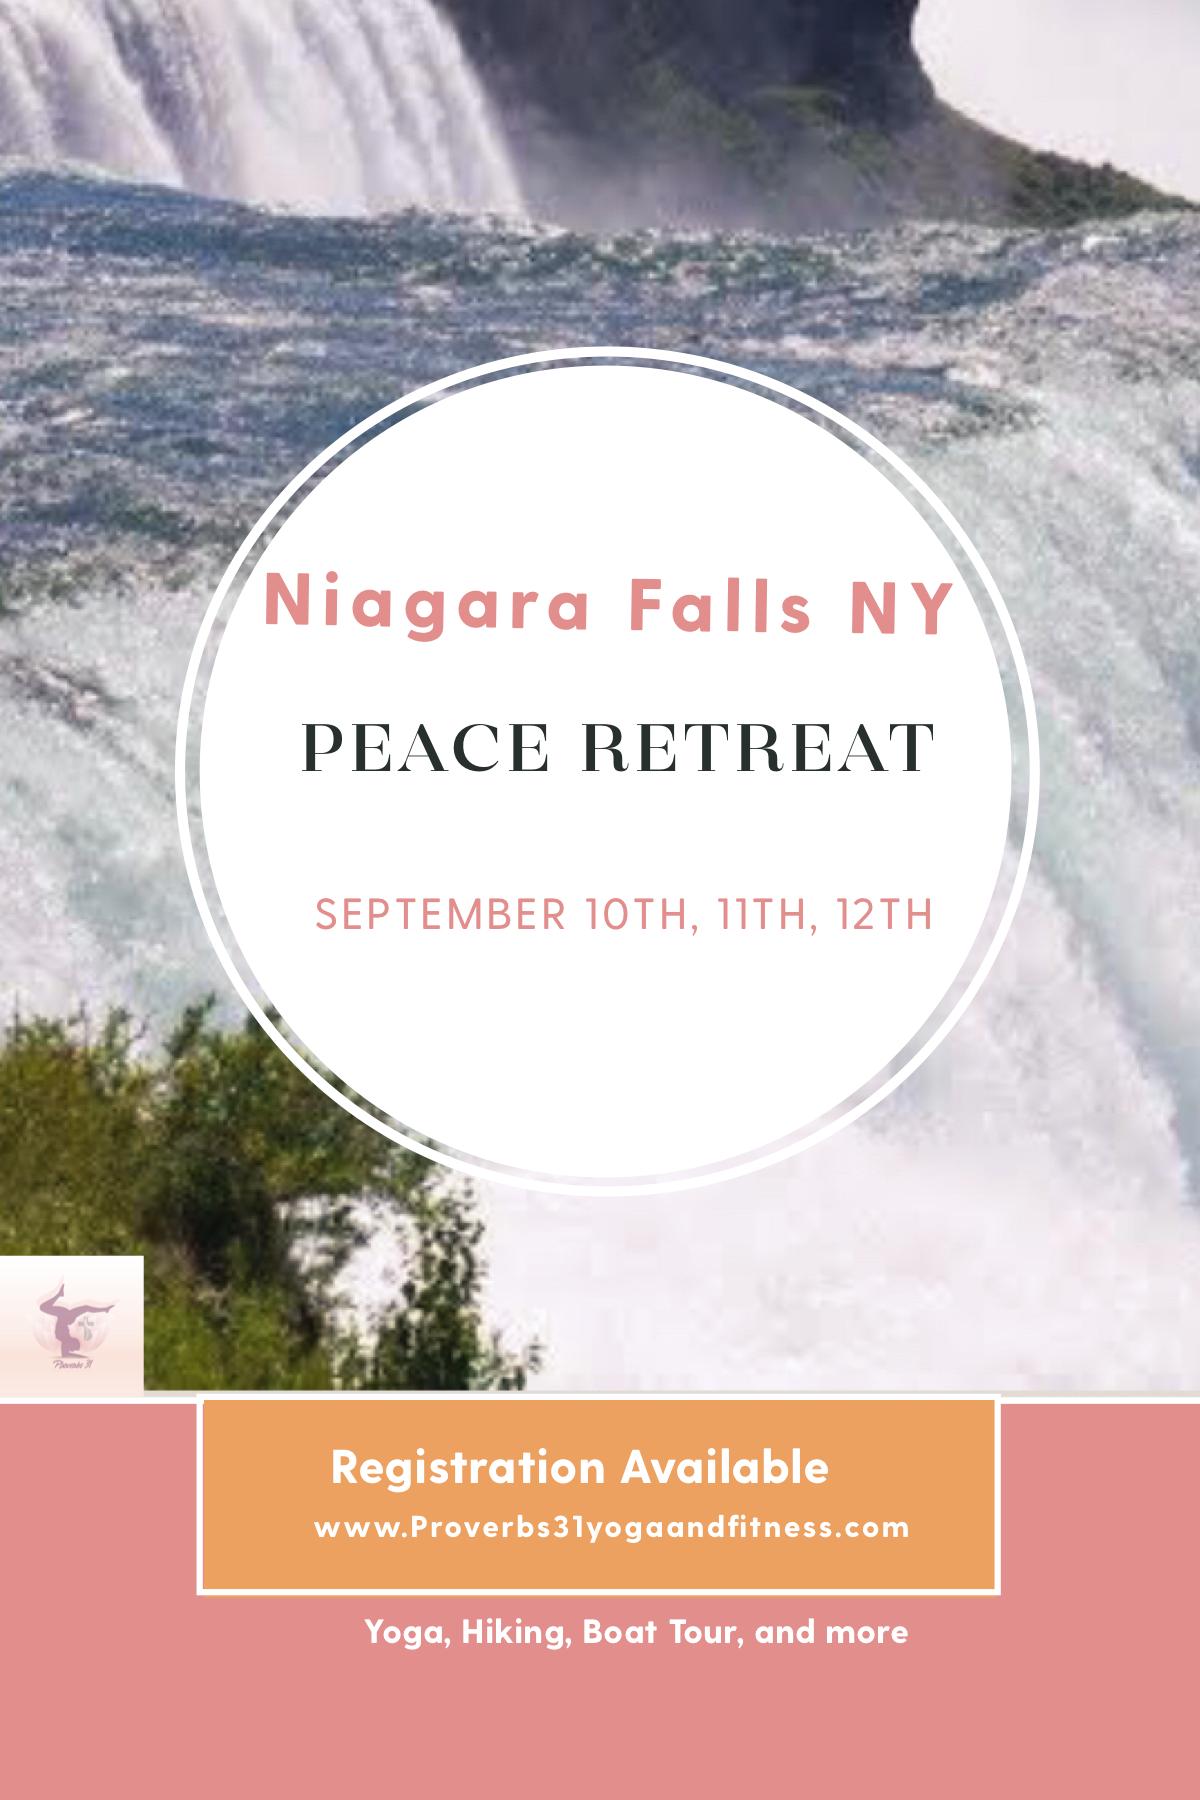 Peace Retreat